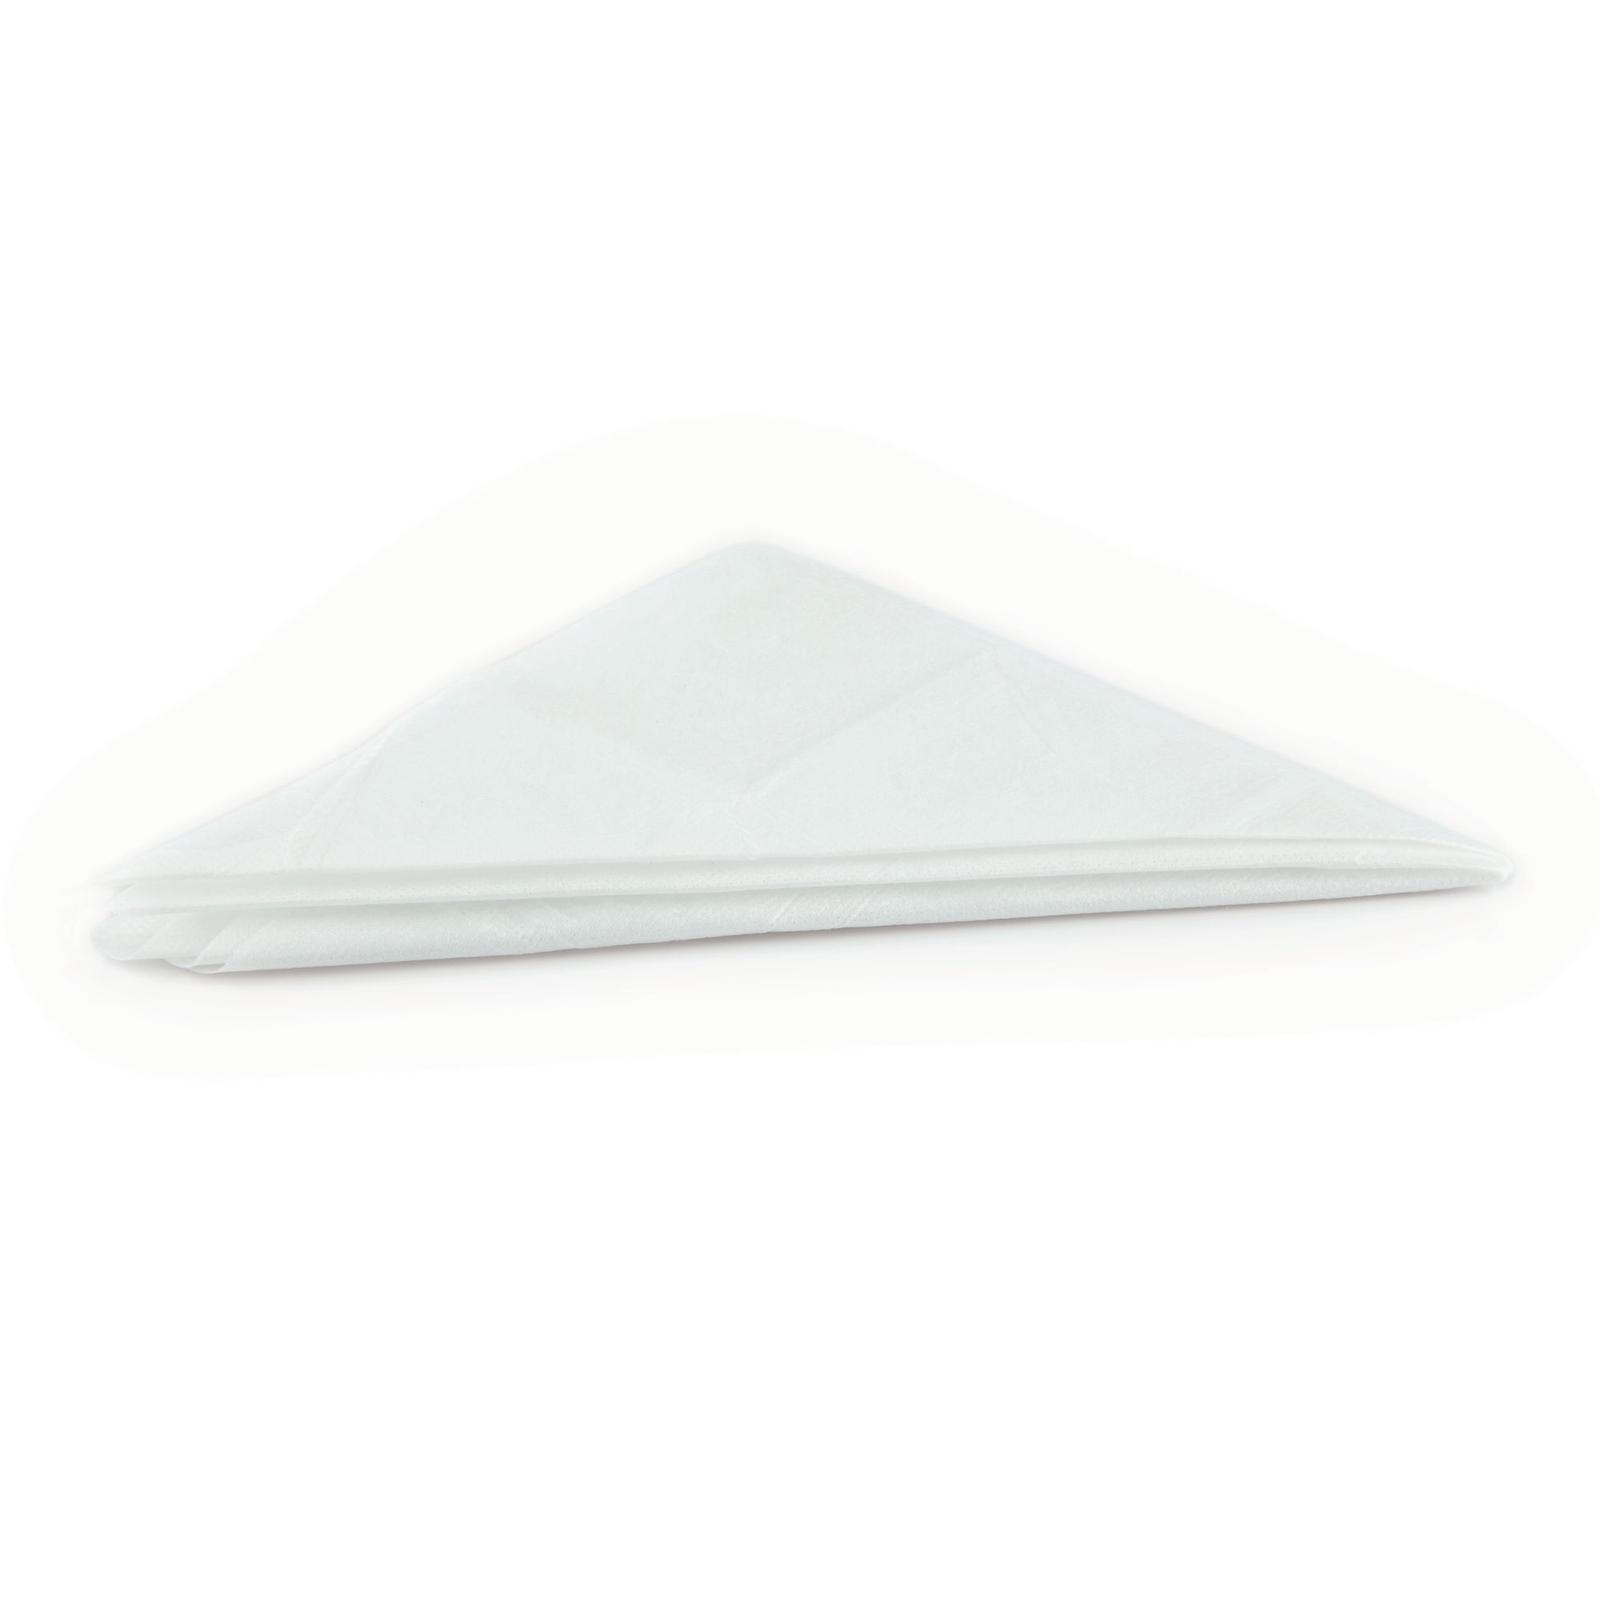 Triangular Bandage 90x90x127cm